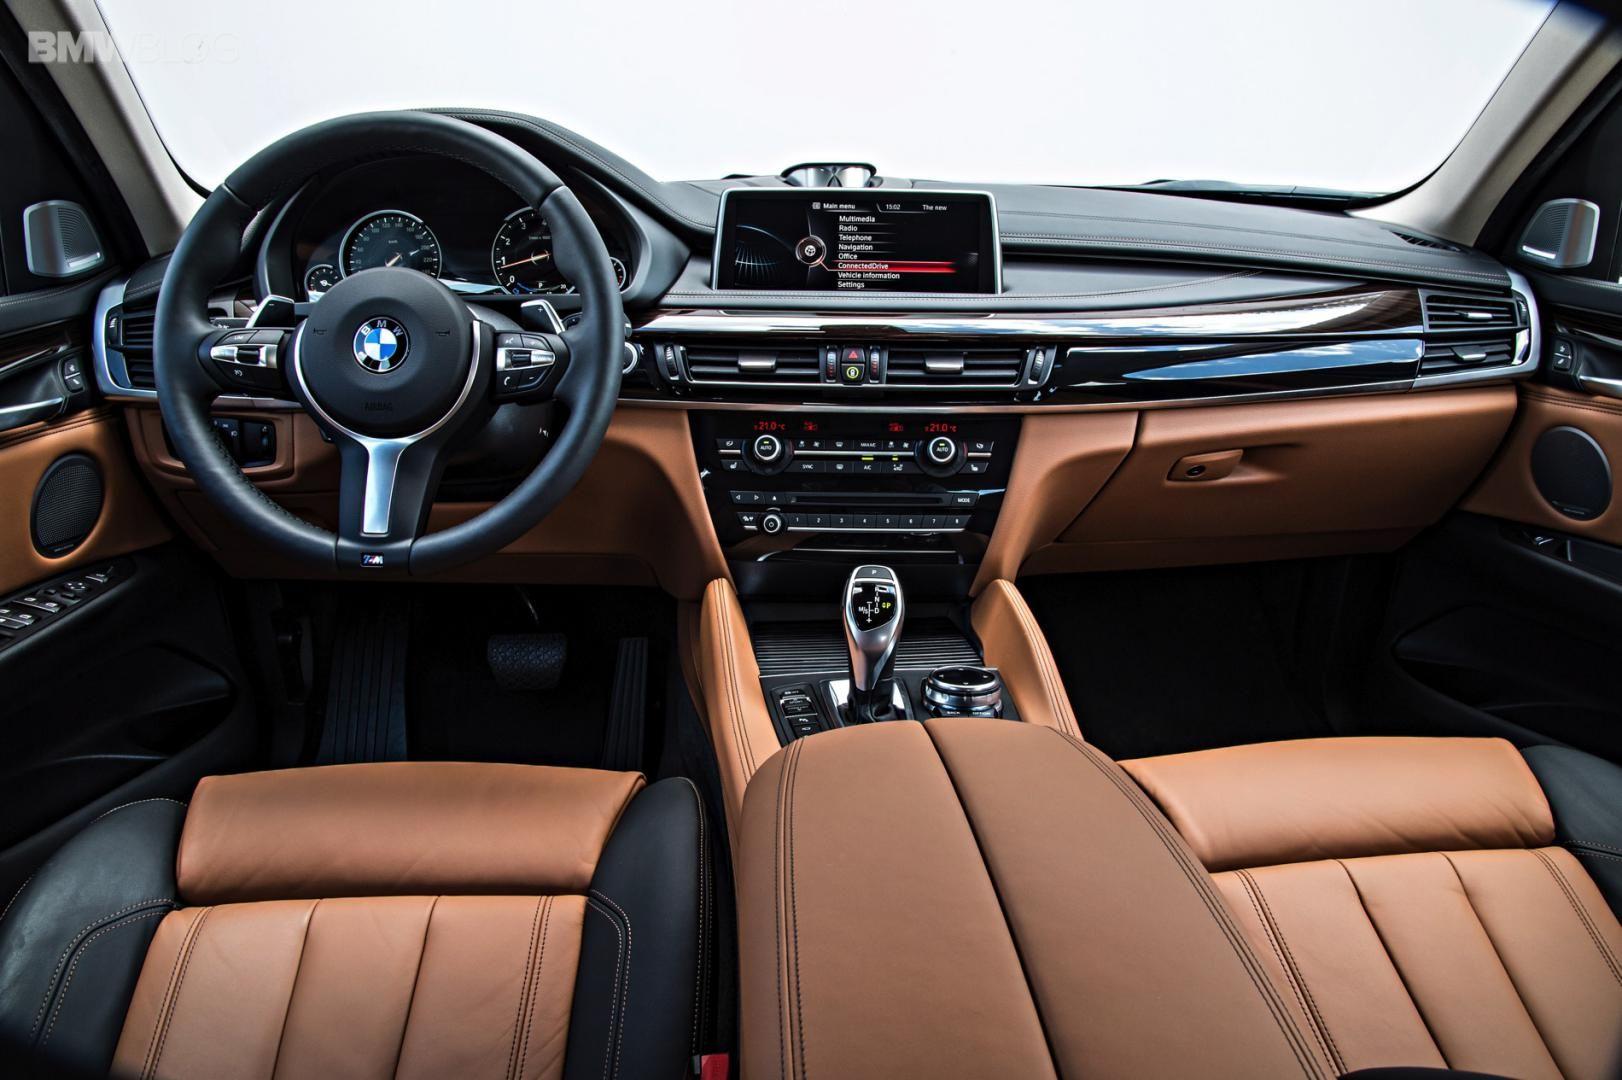 Bmw X6 Interior Dashboard